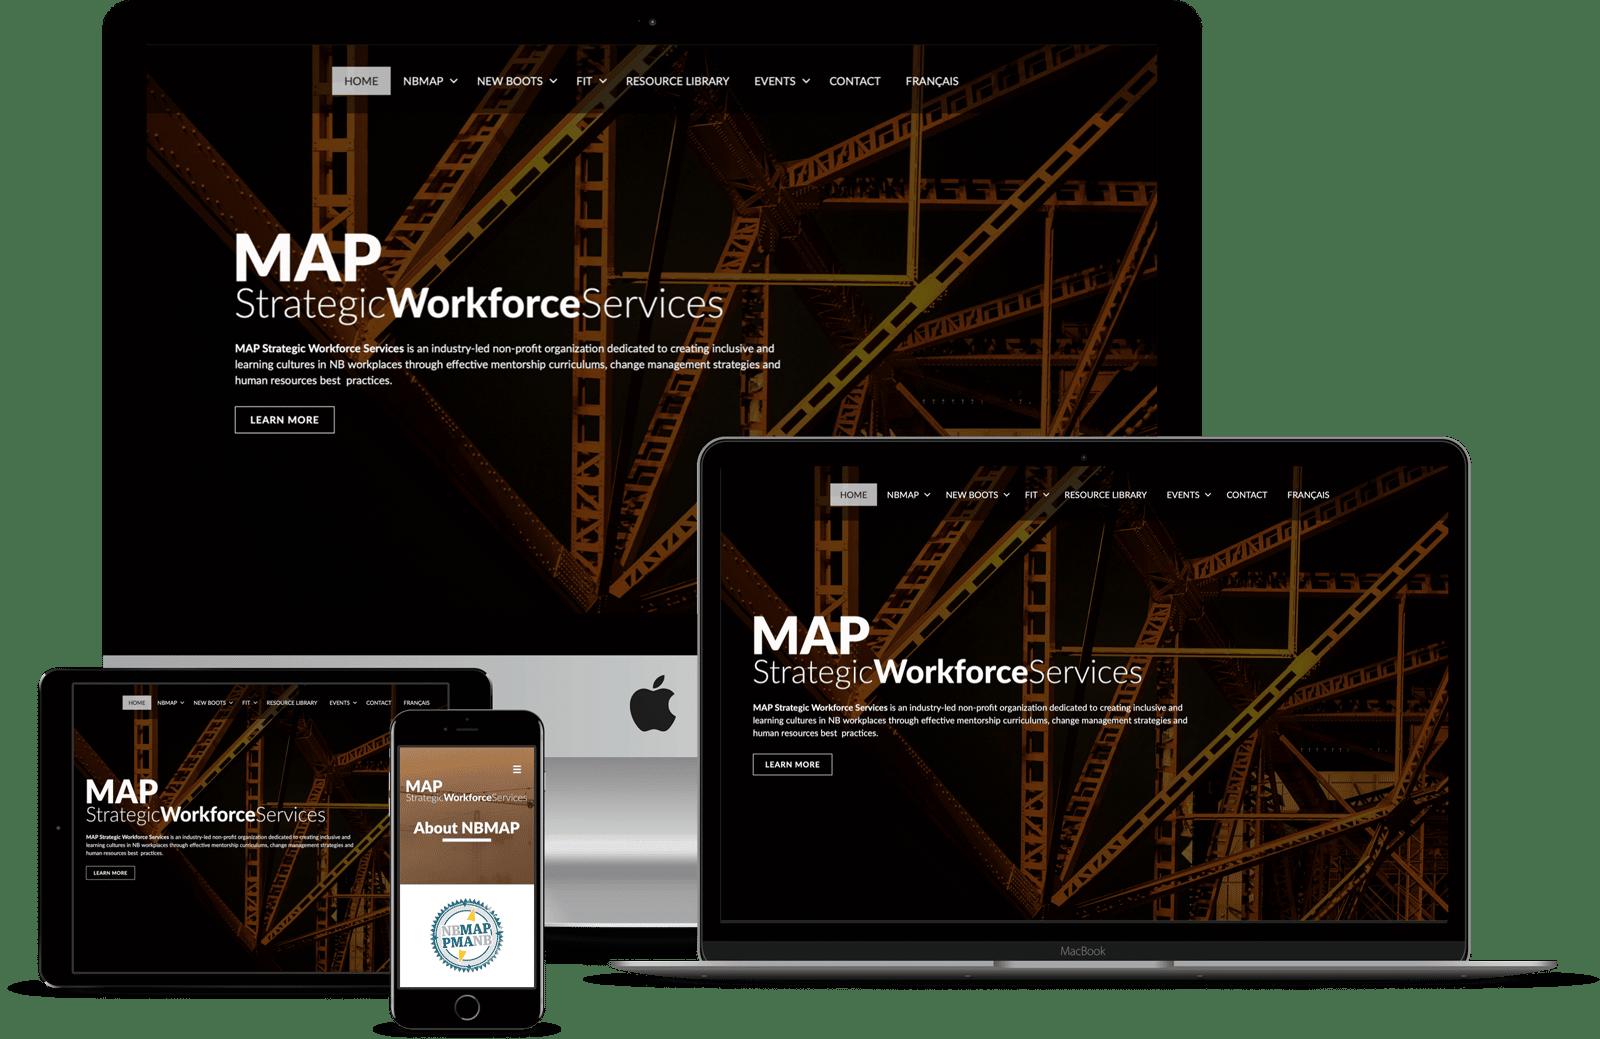 The Pridham Group Website Design of MAPSWS